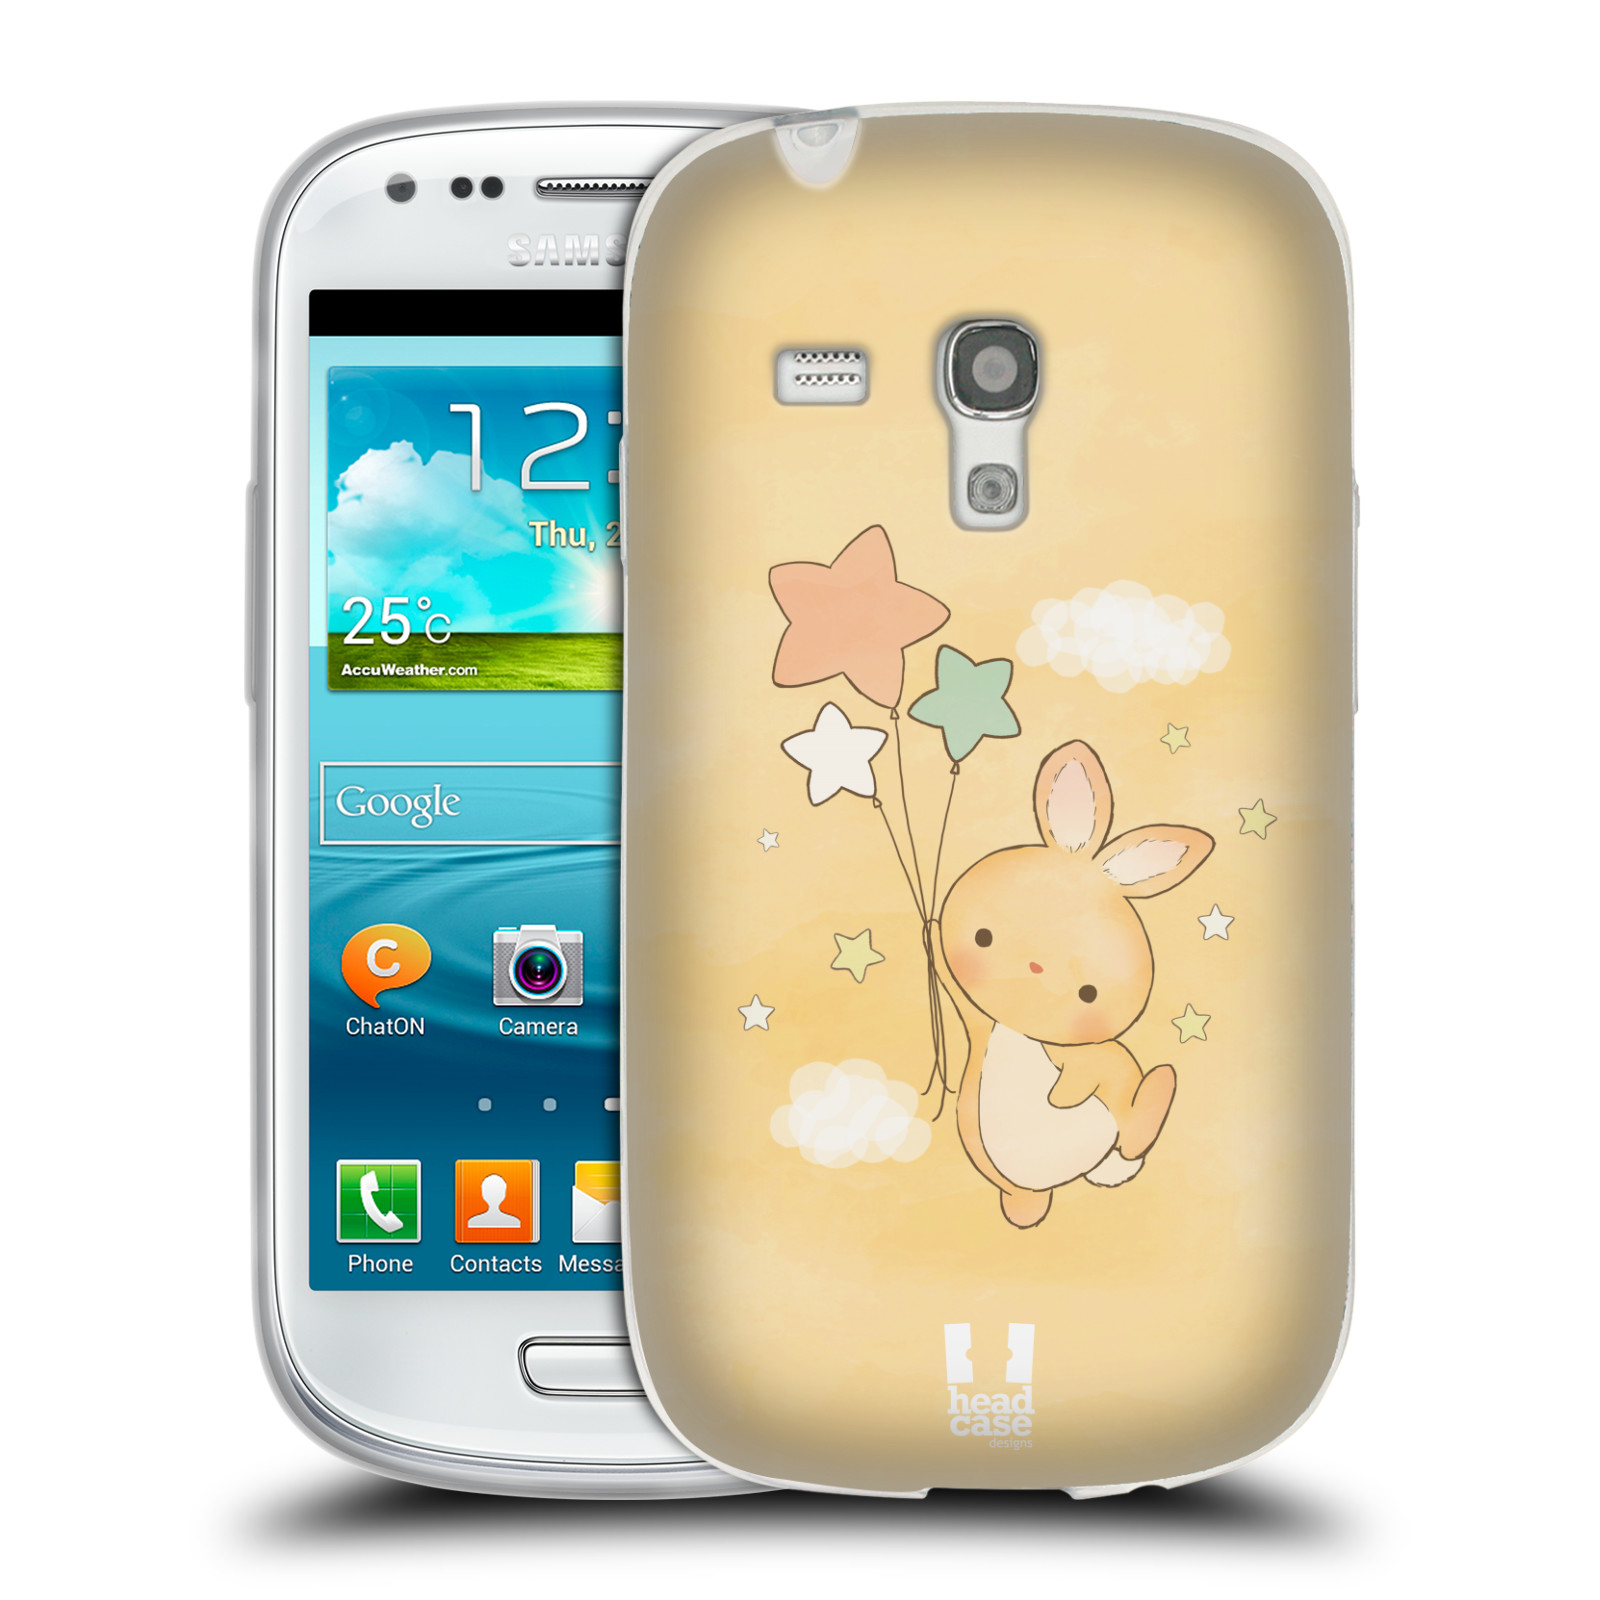 HEAD CASE silikonový obal na mobil Samsung Galaxy S3 MINI i8190 vzor králíček a hvězdy žlutá